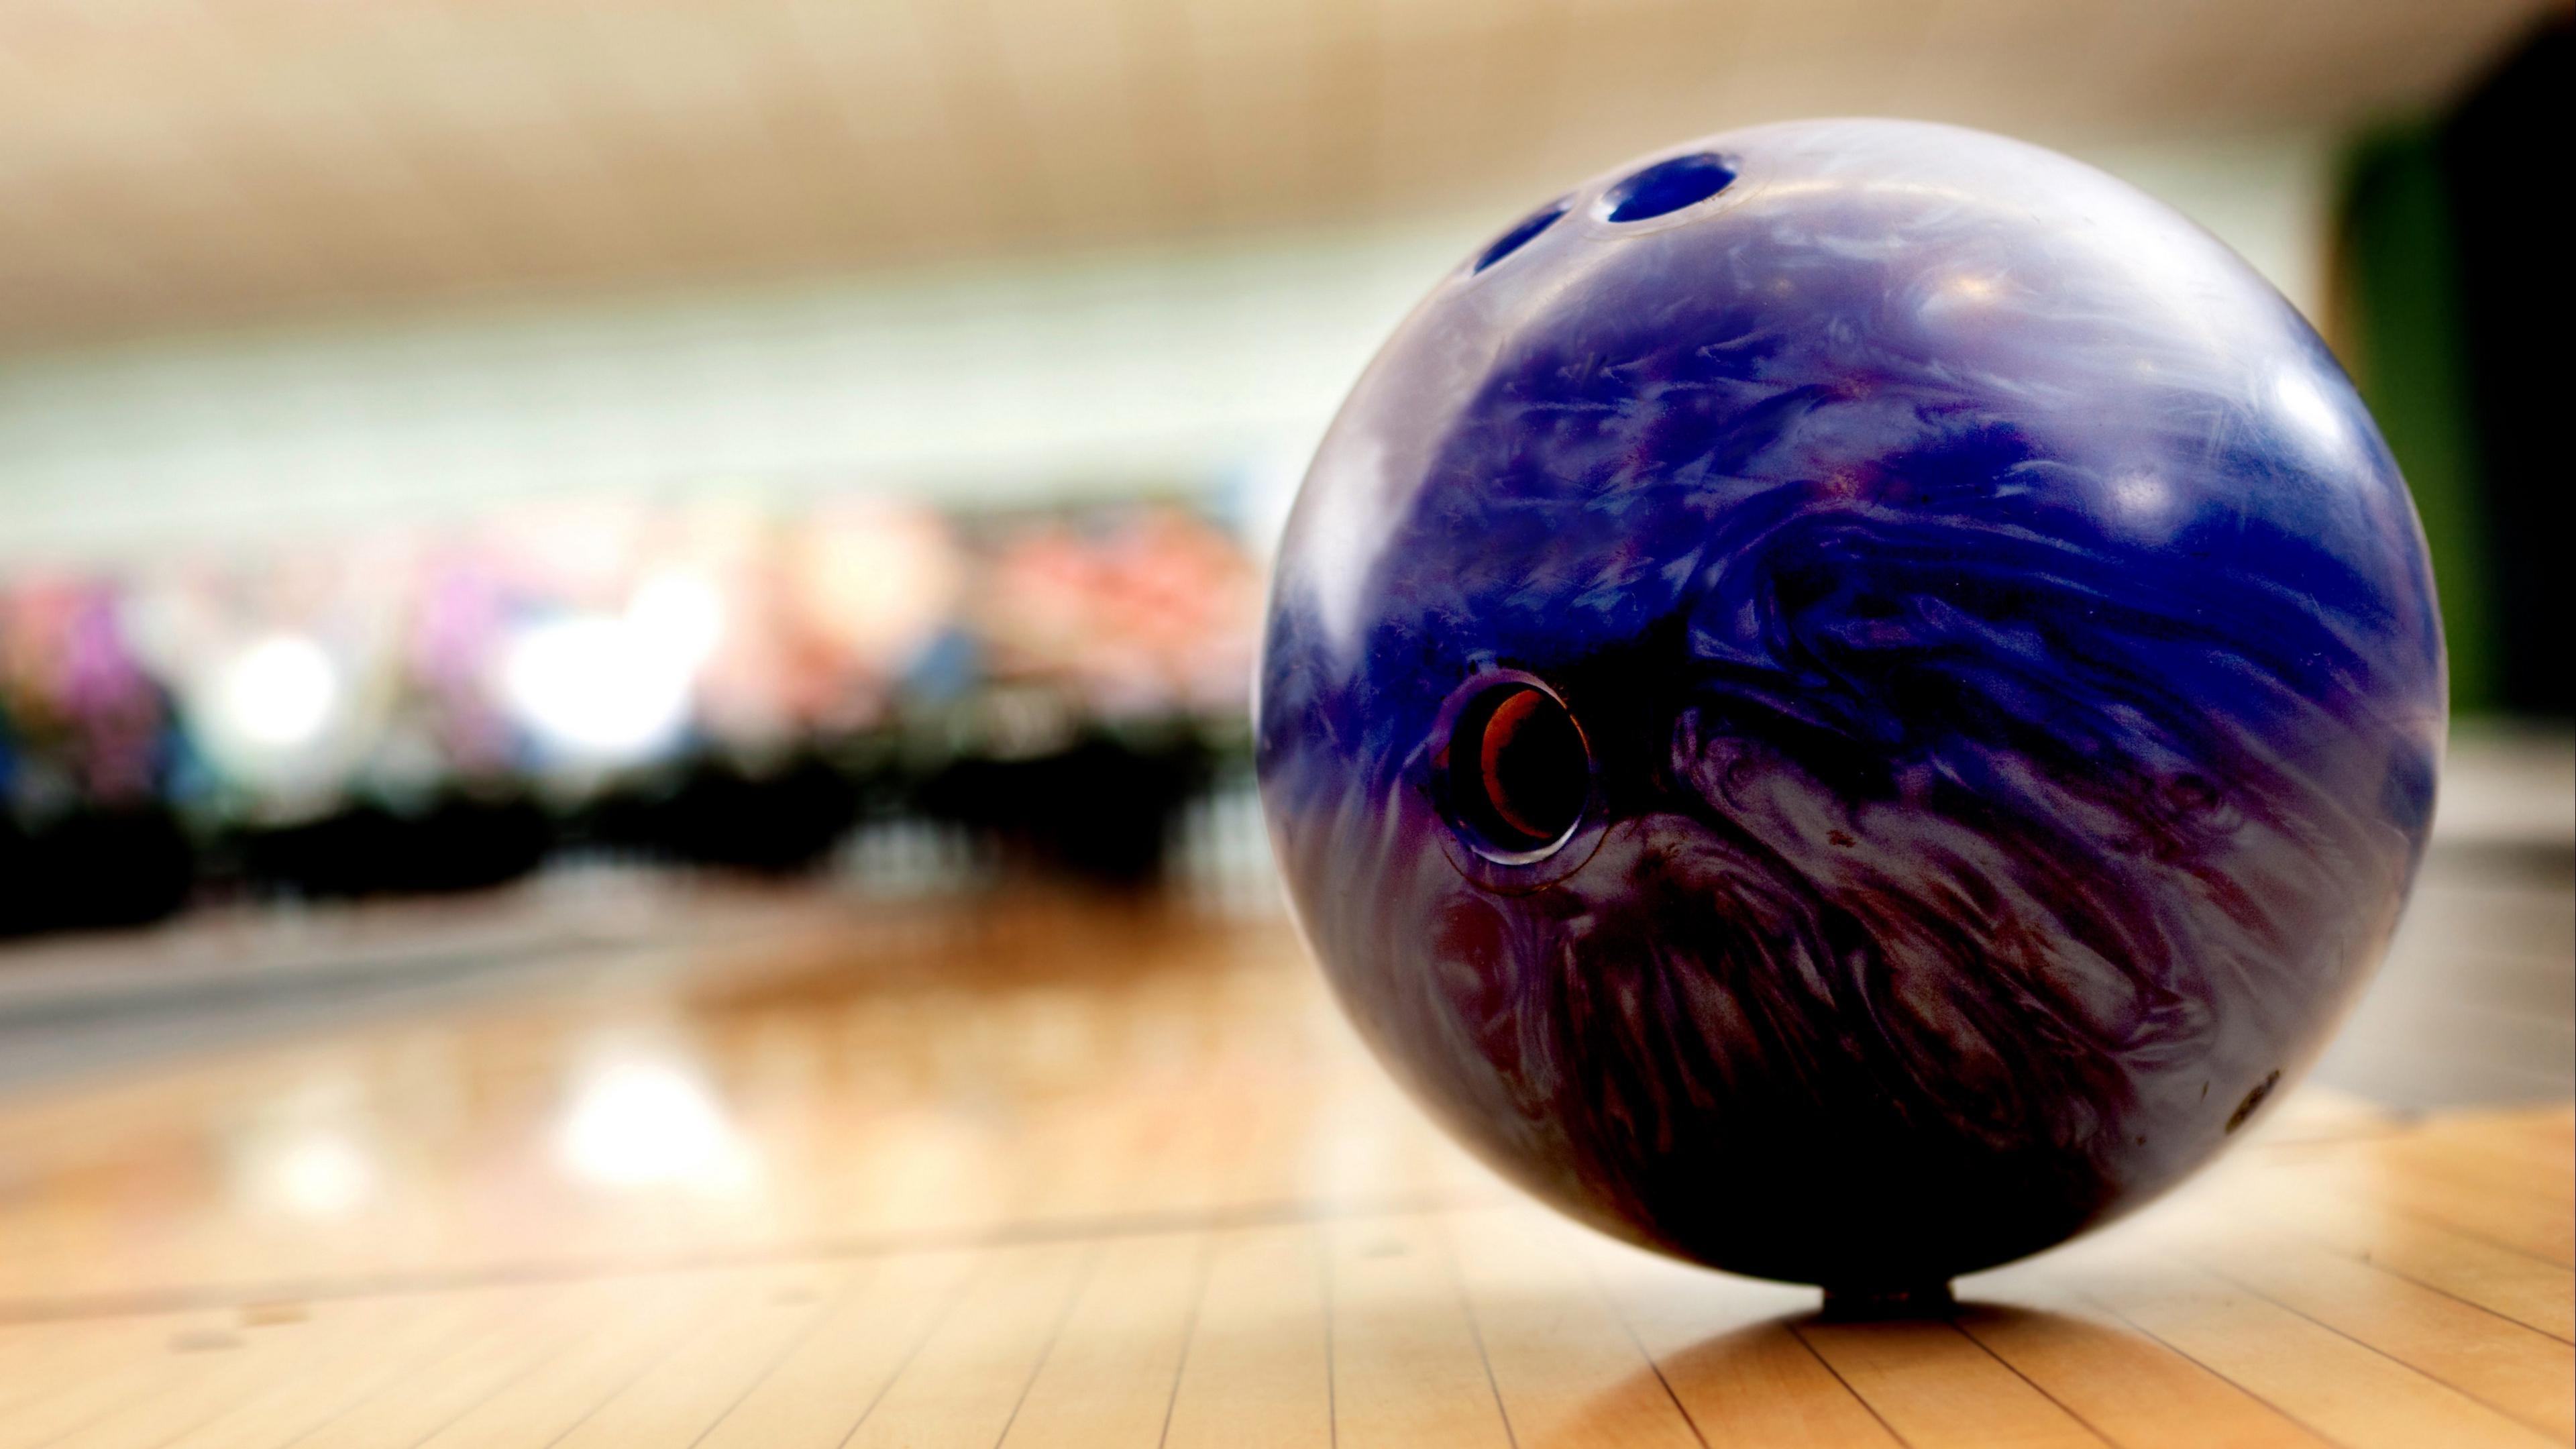 bowling ball blurred background 4k 1540062138 - bowling, ball, blurred background 4k - bowling, blurred background, Ball